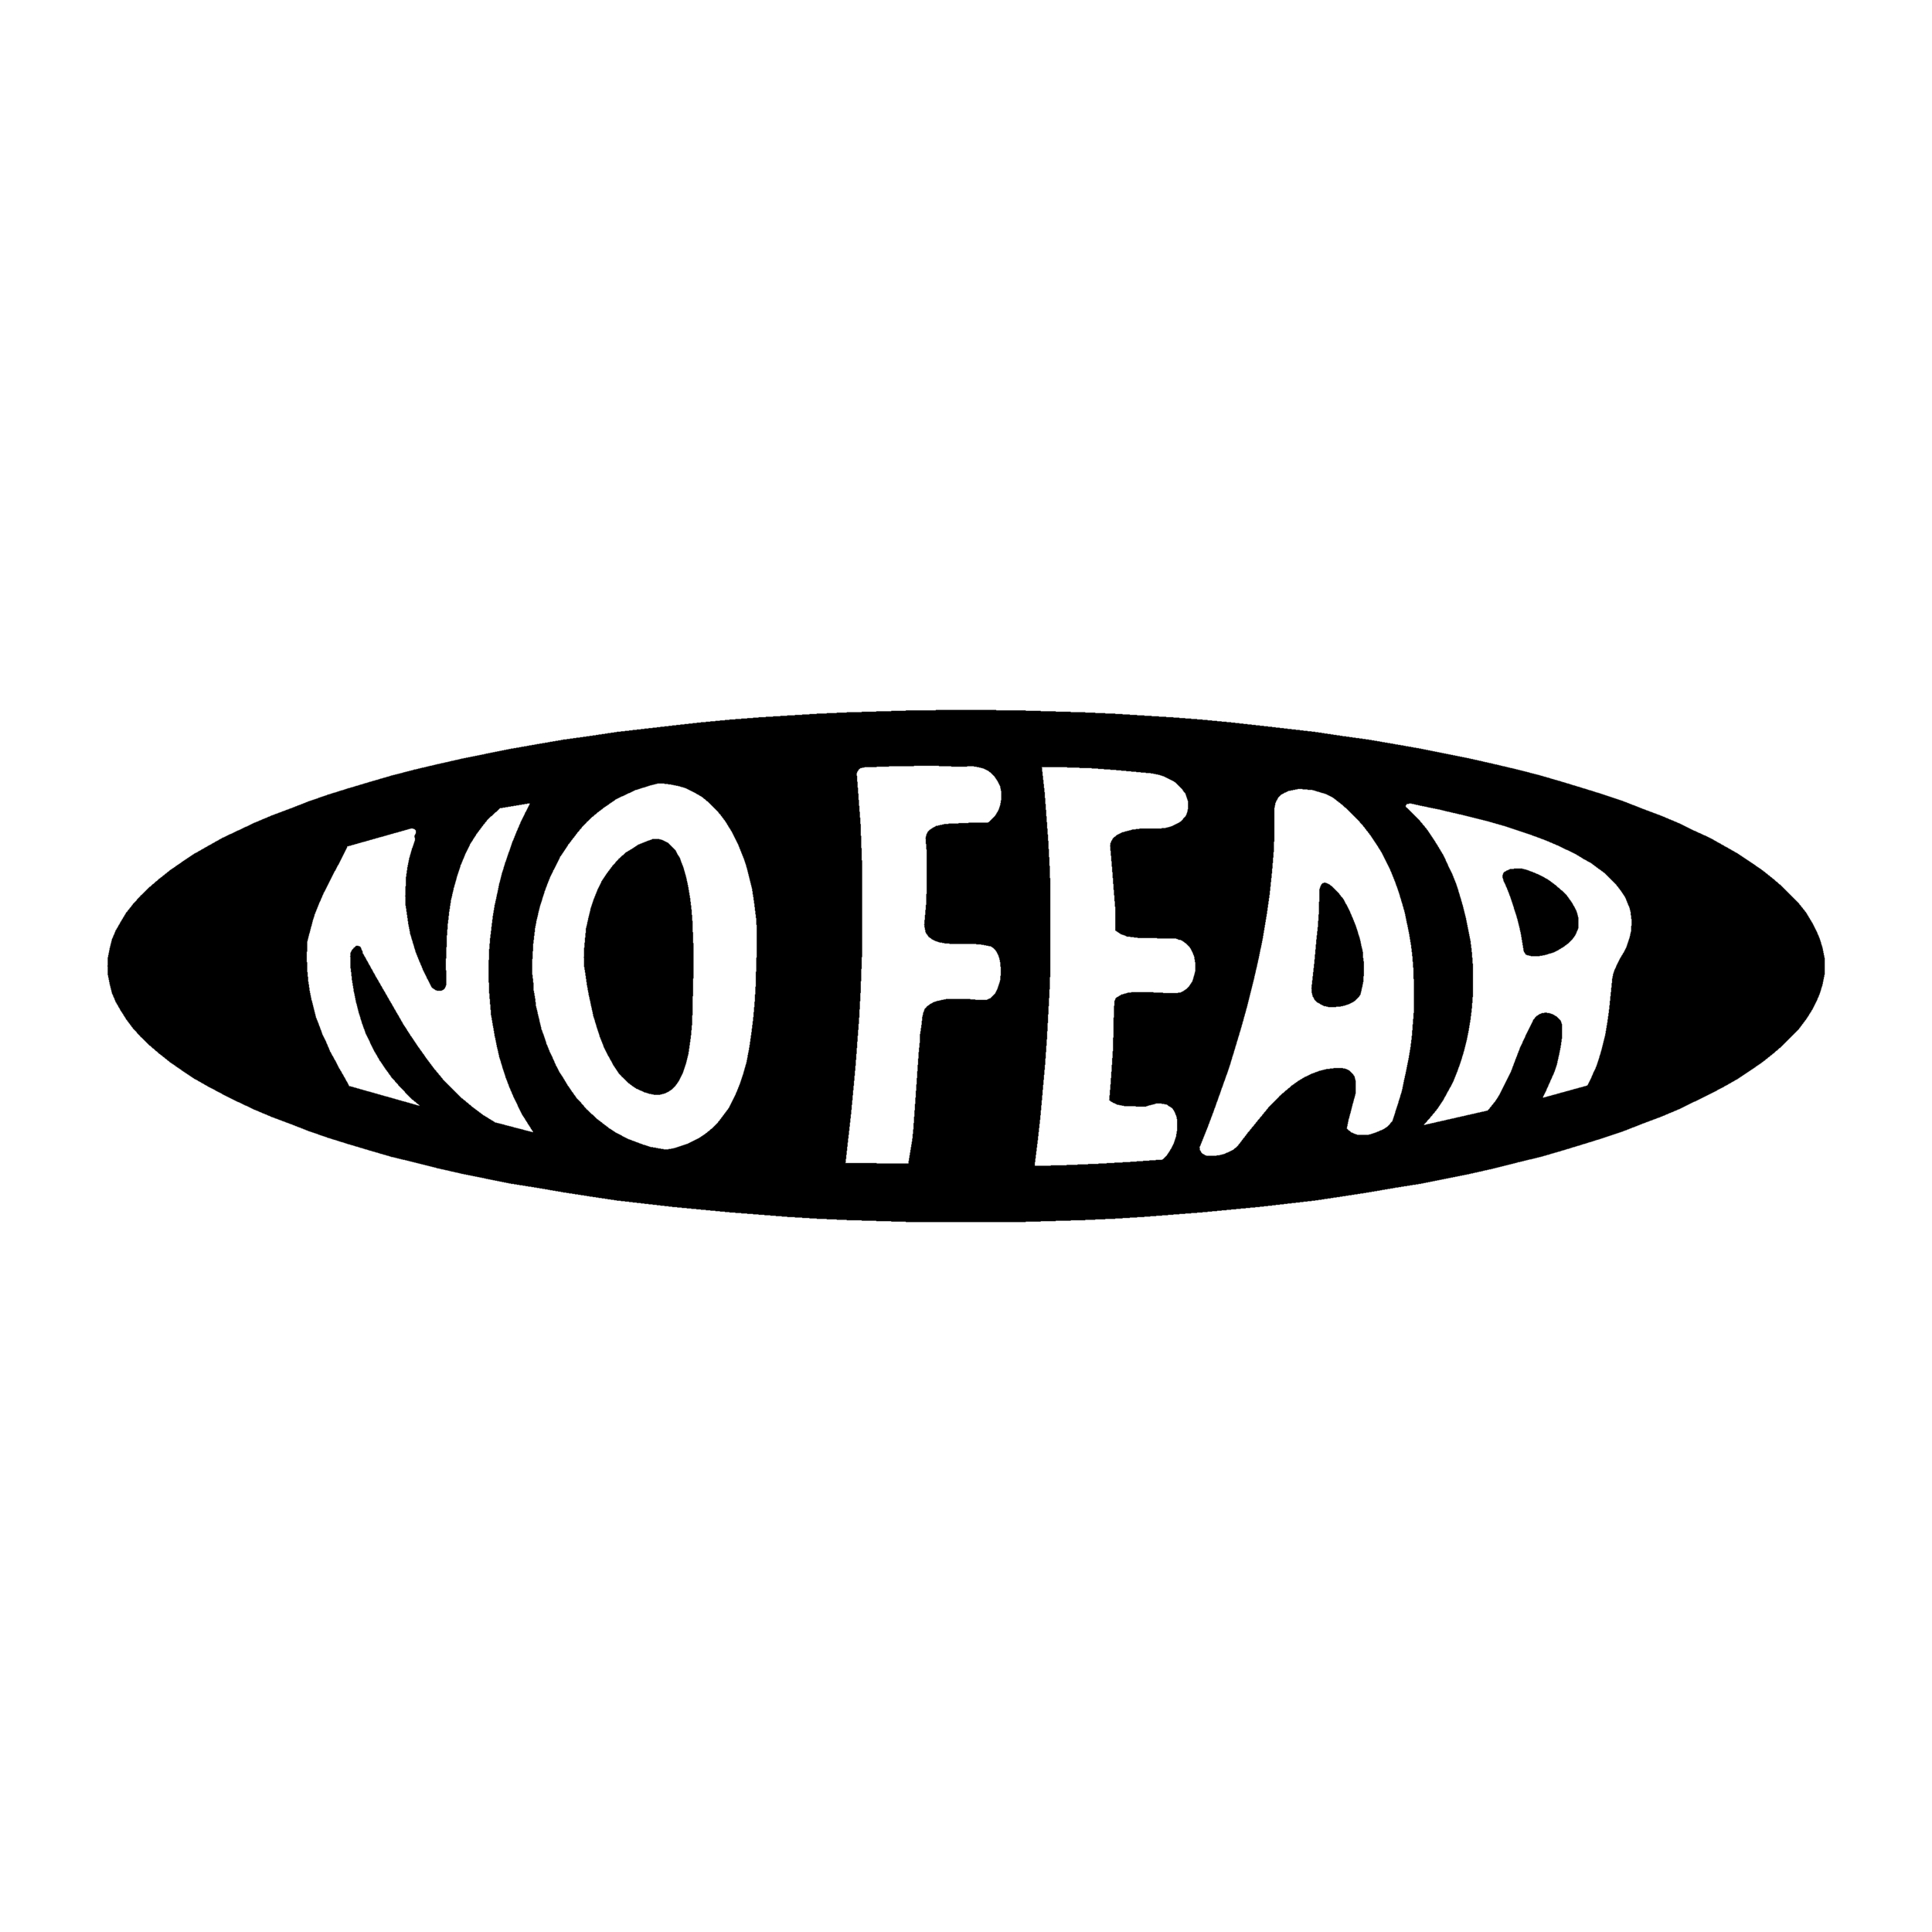 stickers no fear ref 4 tuning audio sonorisation car auto moto camion competition deco rallye autocollant